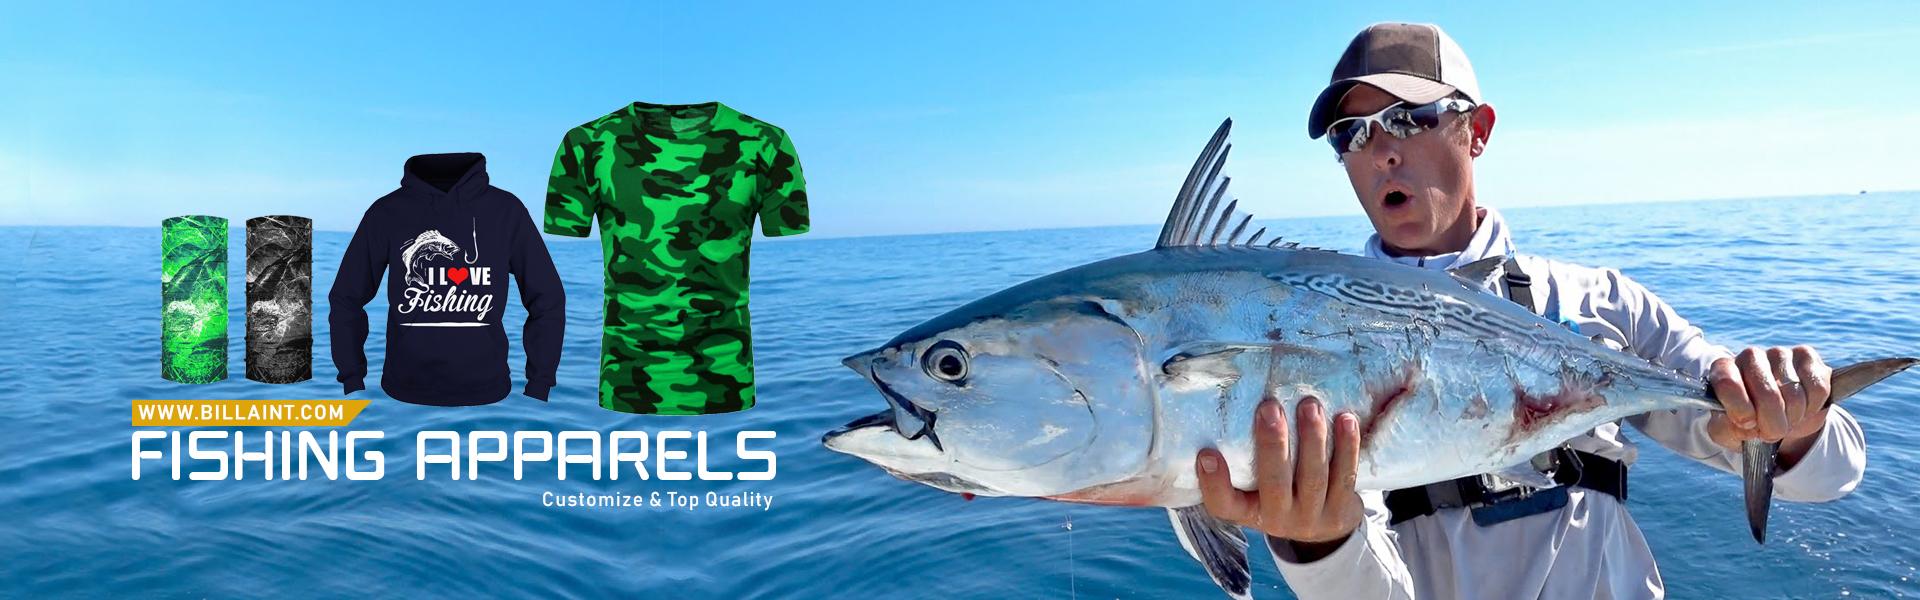 Fishing Apparels